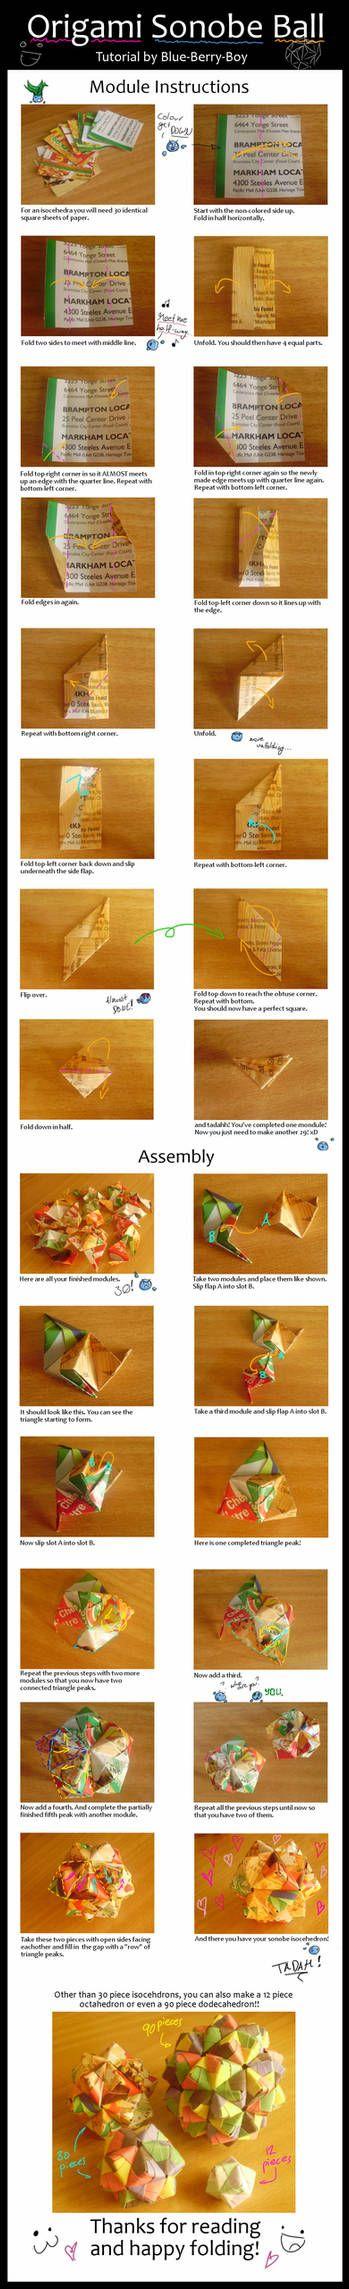 Origami And Kirigami, Paper Crafts Origami, Oragami, Diy Paper, Origami Wedding, Origami Ball, Origami Diagrams, Useful Origami, Simple Origami